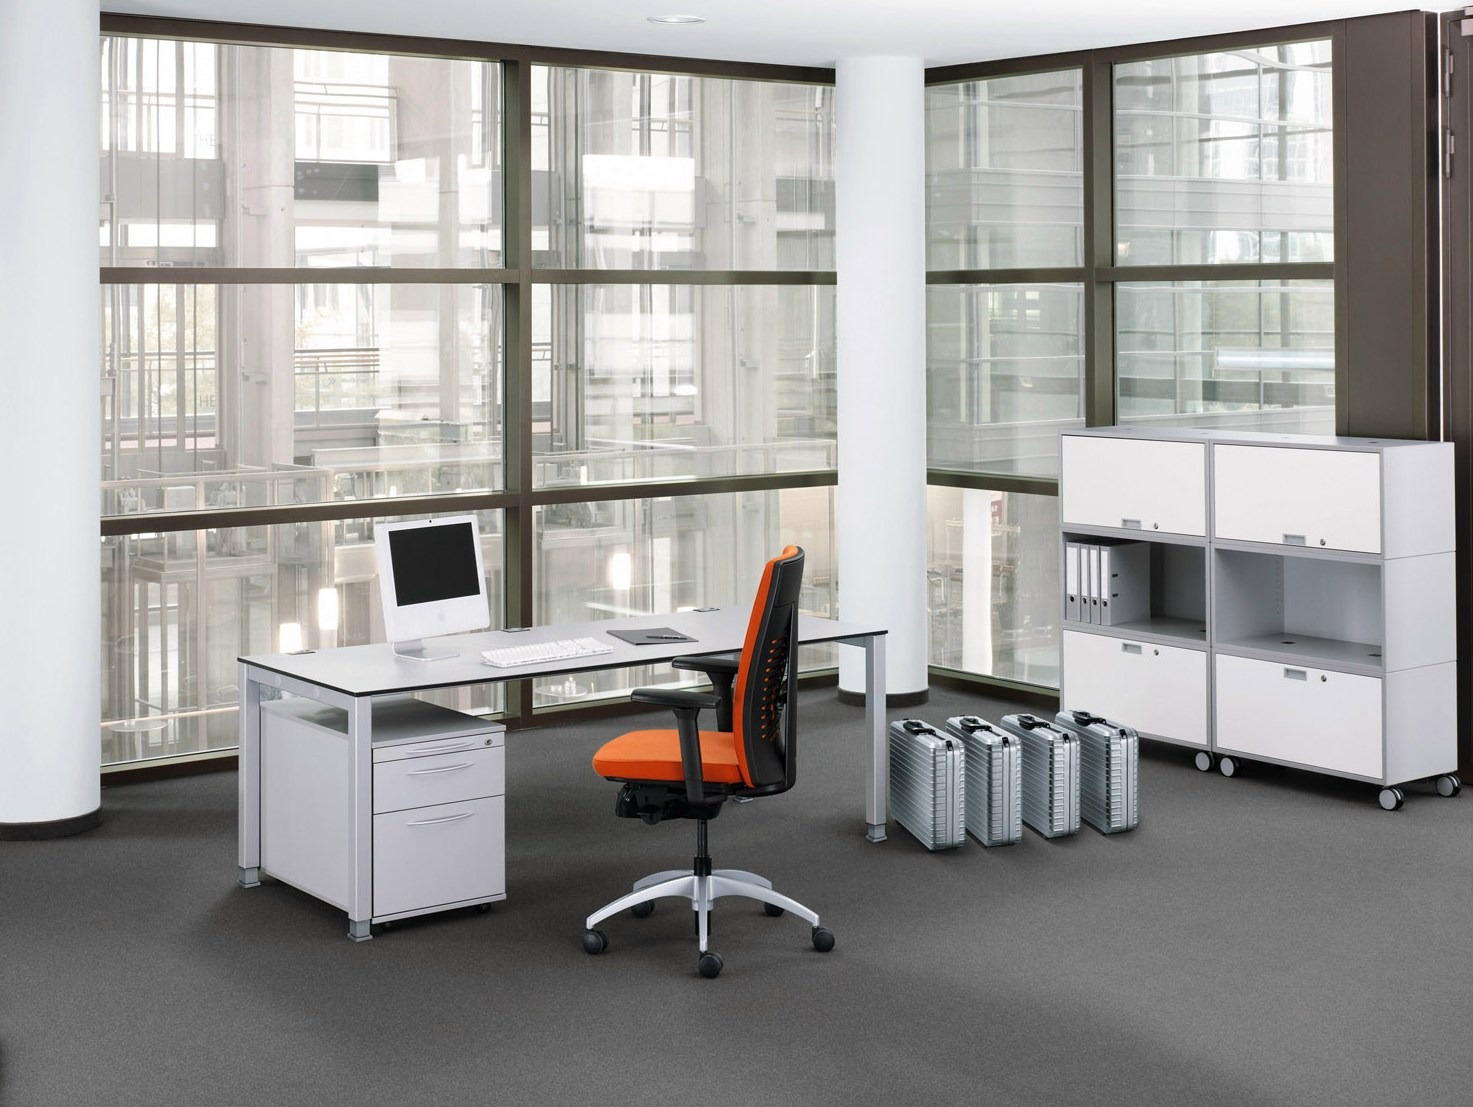 25 knig neurath office furniture systems high end. Black Bedroom Furniture Sets. Home Design Ideas